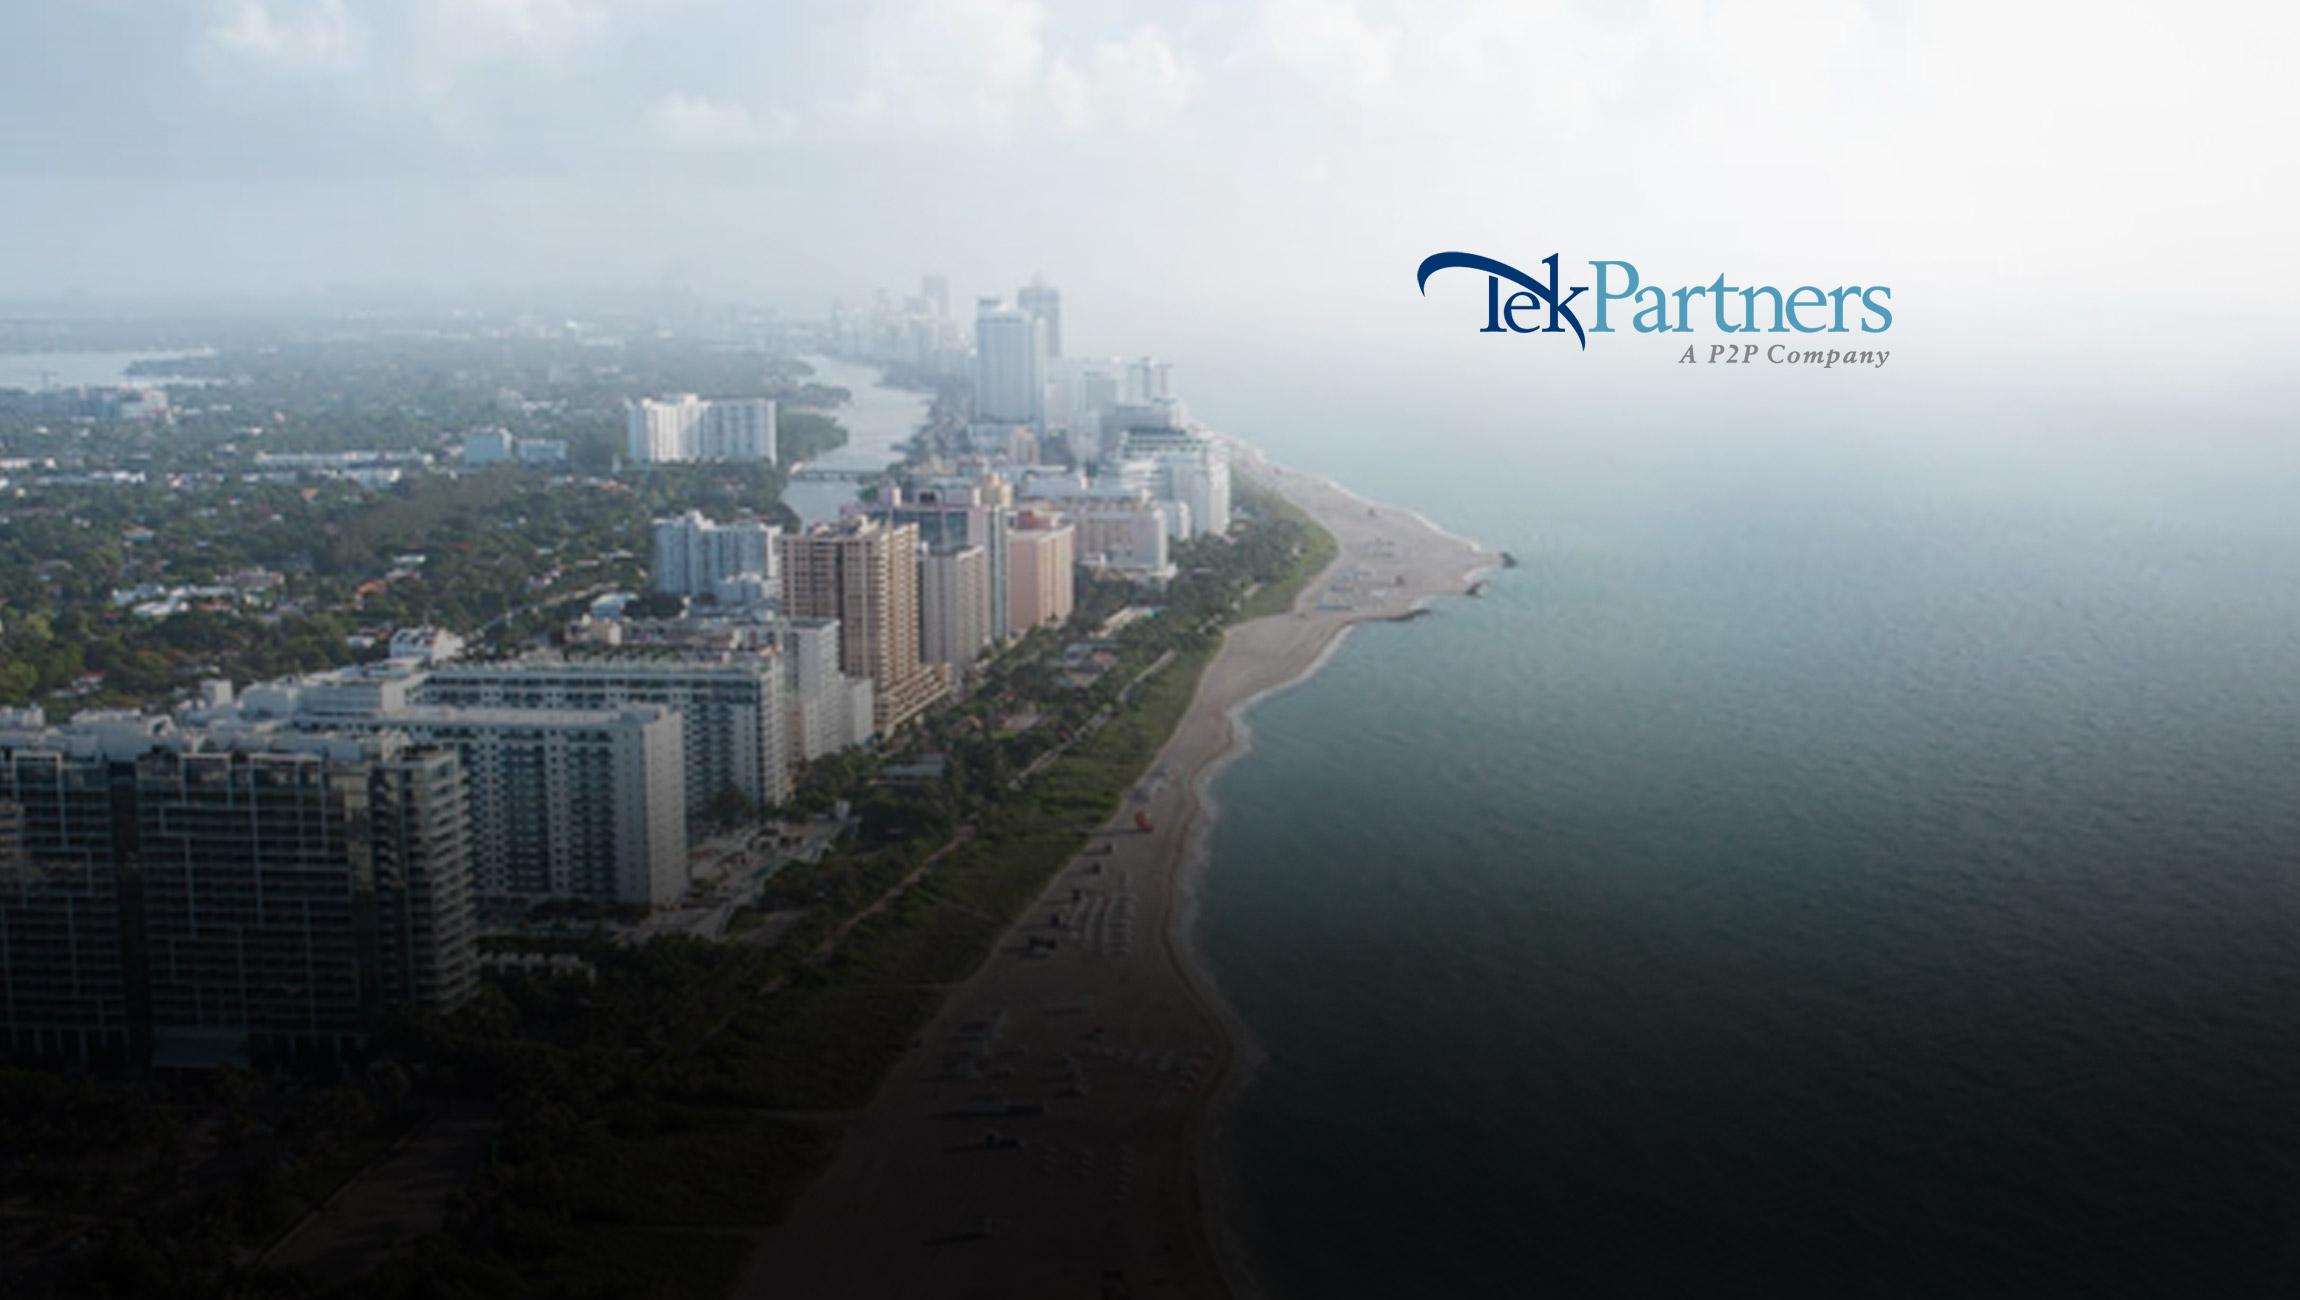 TekPartners, a P2P Company, Opens New Miami Location